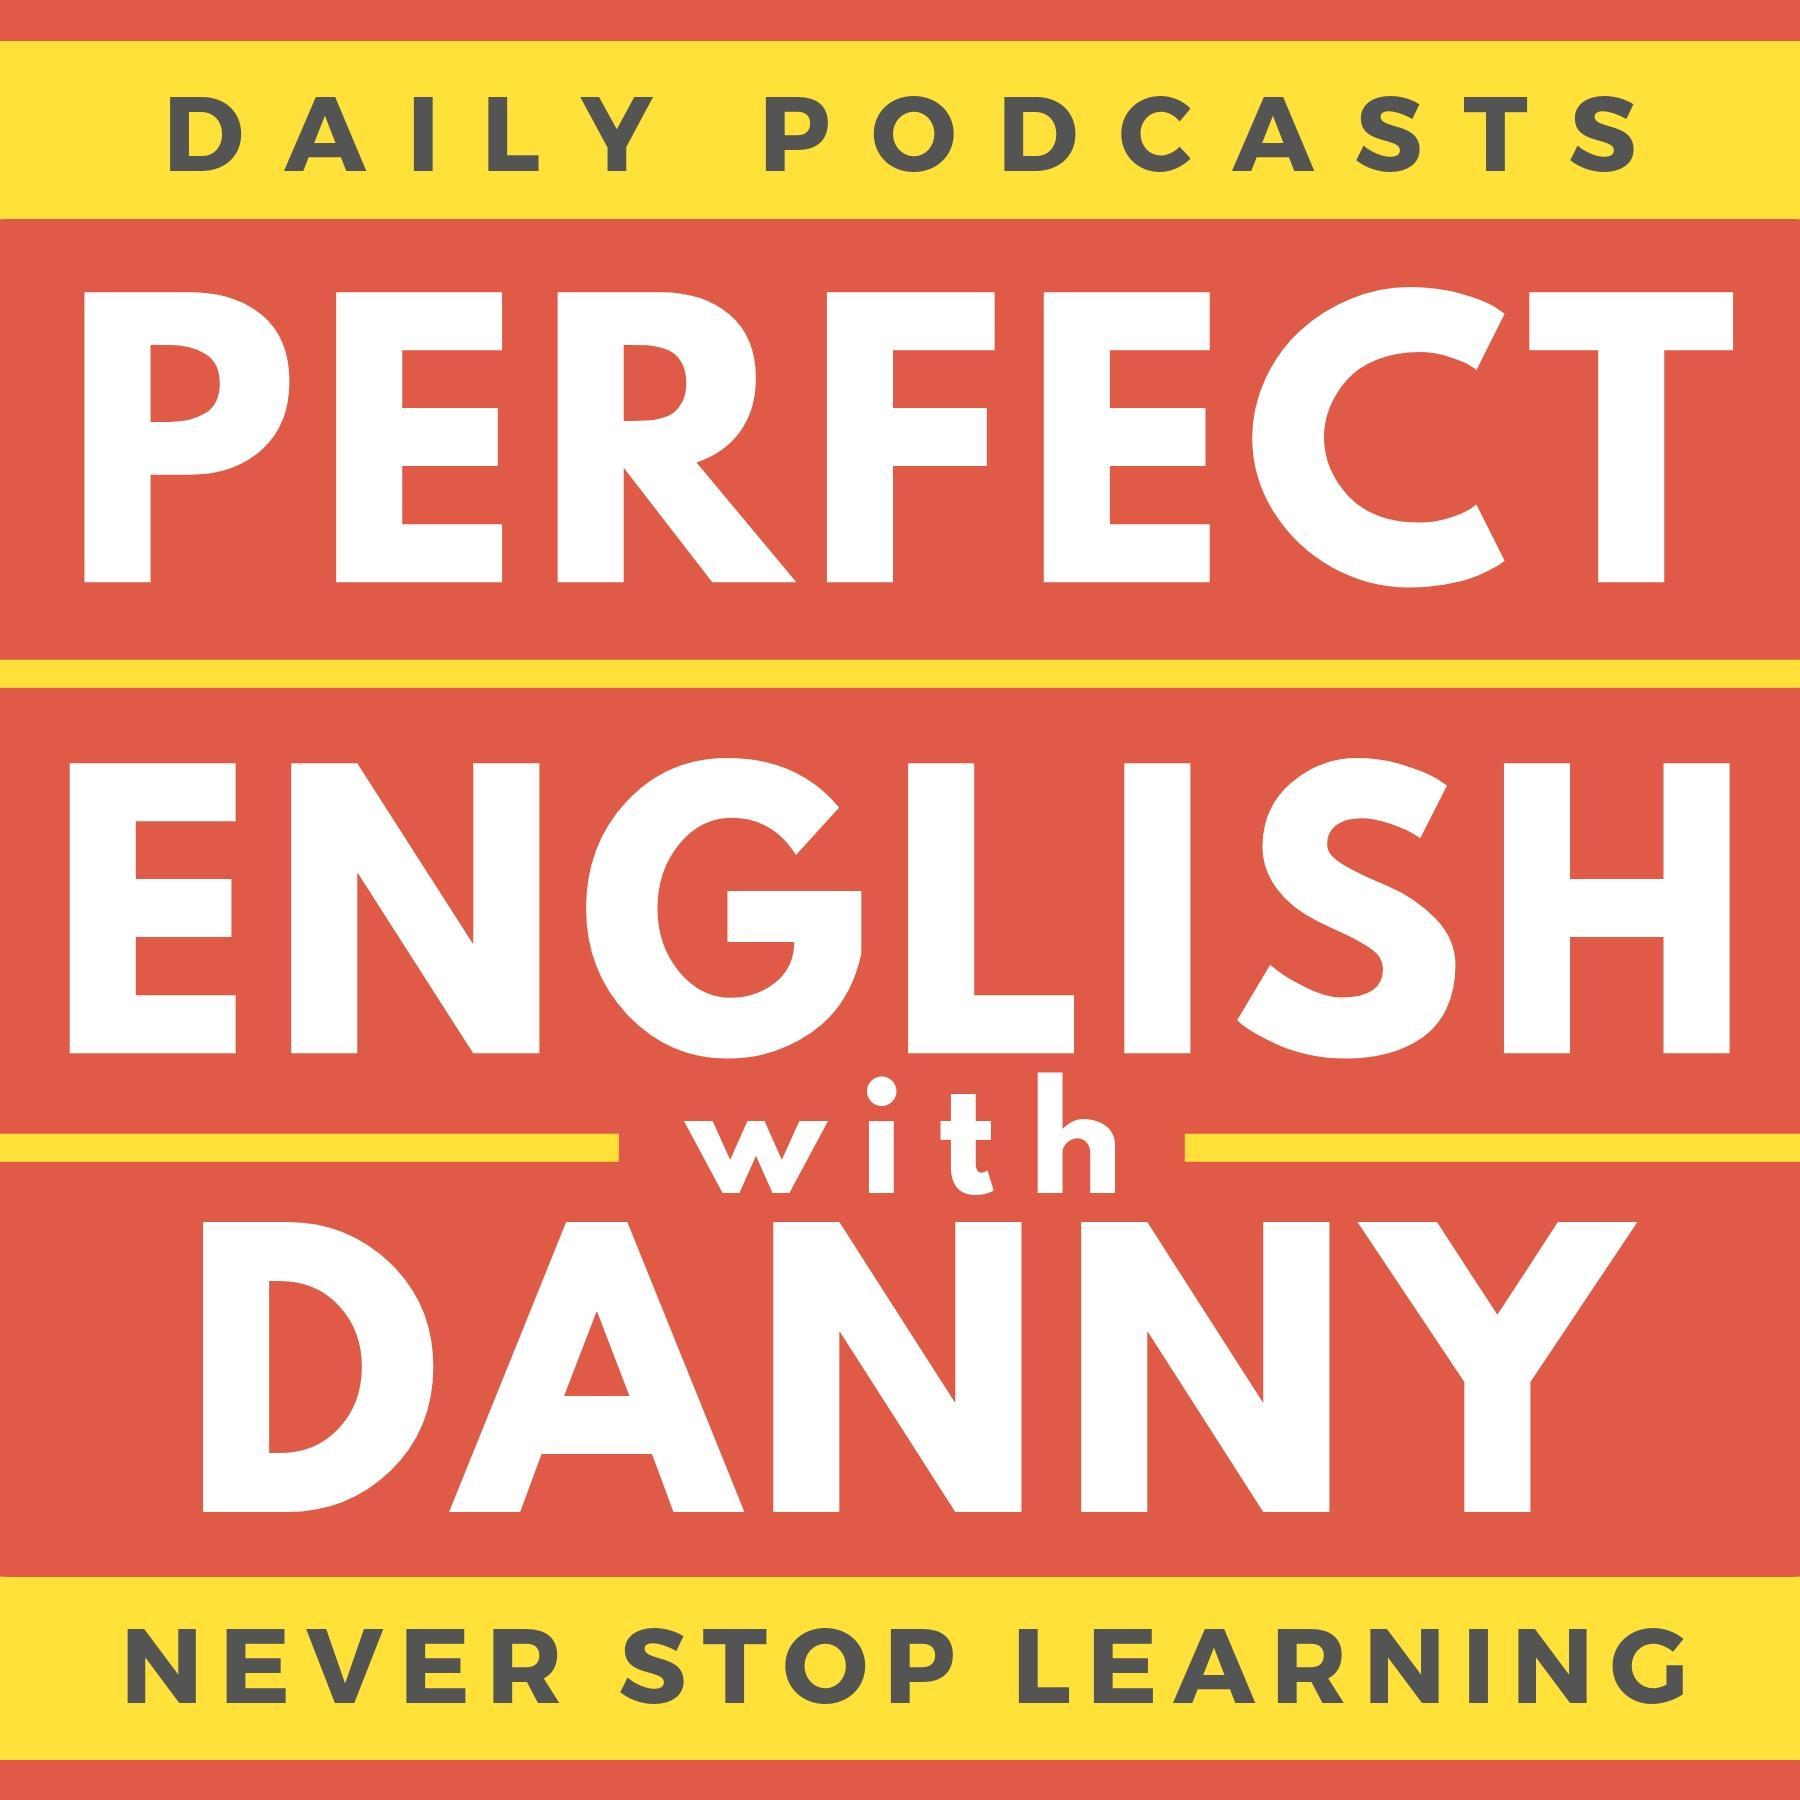 Episode 134 - Vocabulary Builder - Describing Personality 1-4